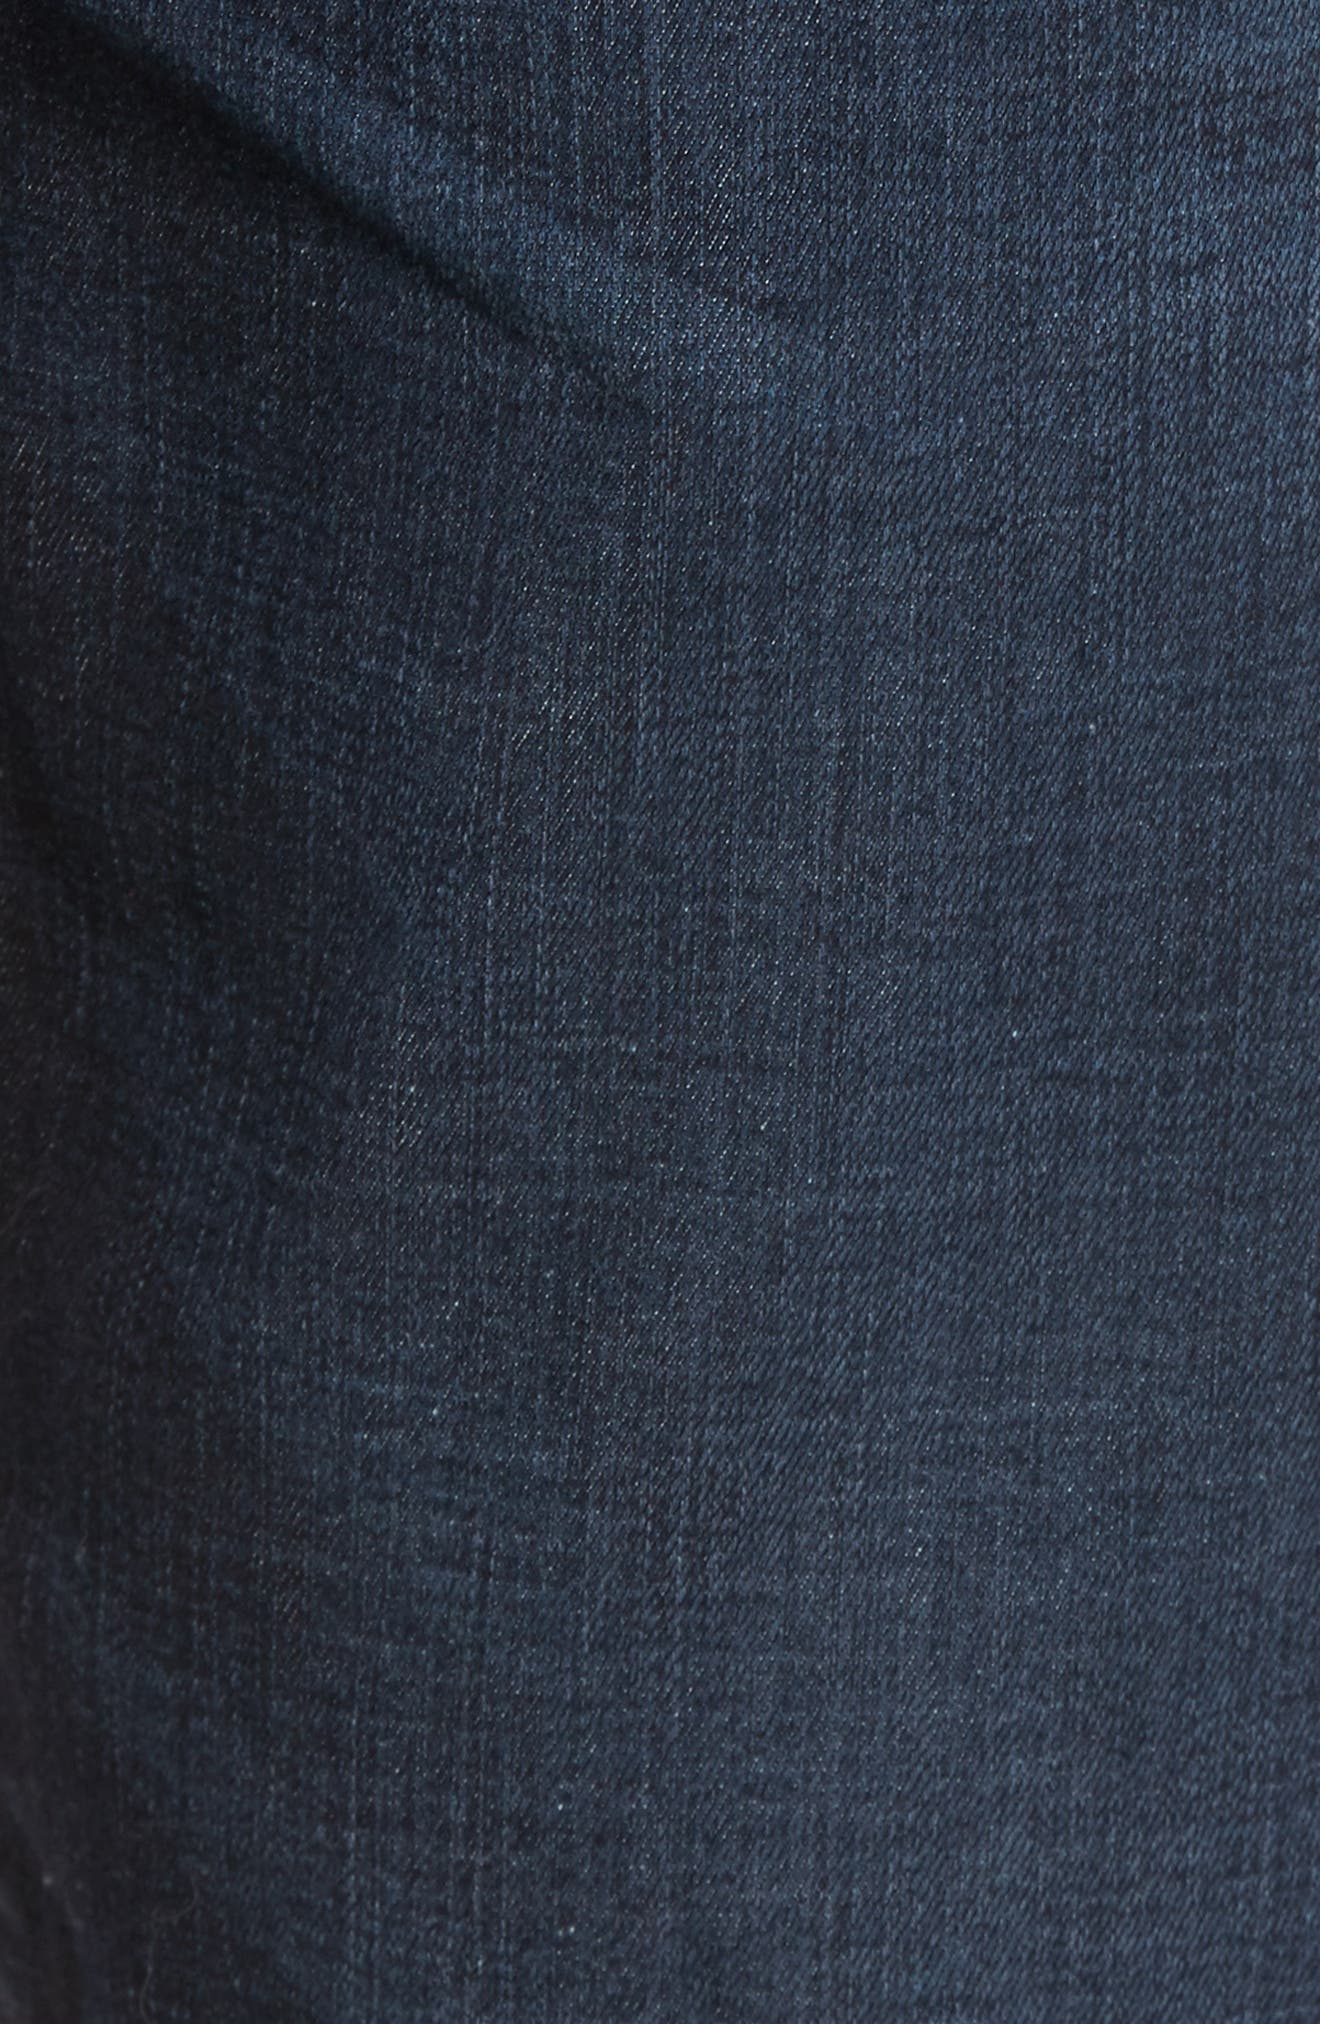 Brixton Slim Straight Leg Jeans,                             Alternate thumbnail 5, color,                             400